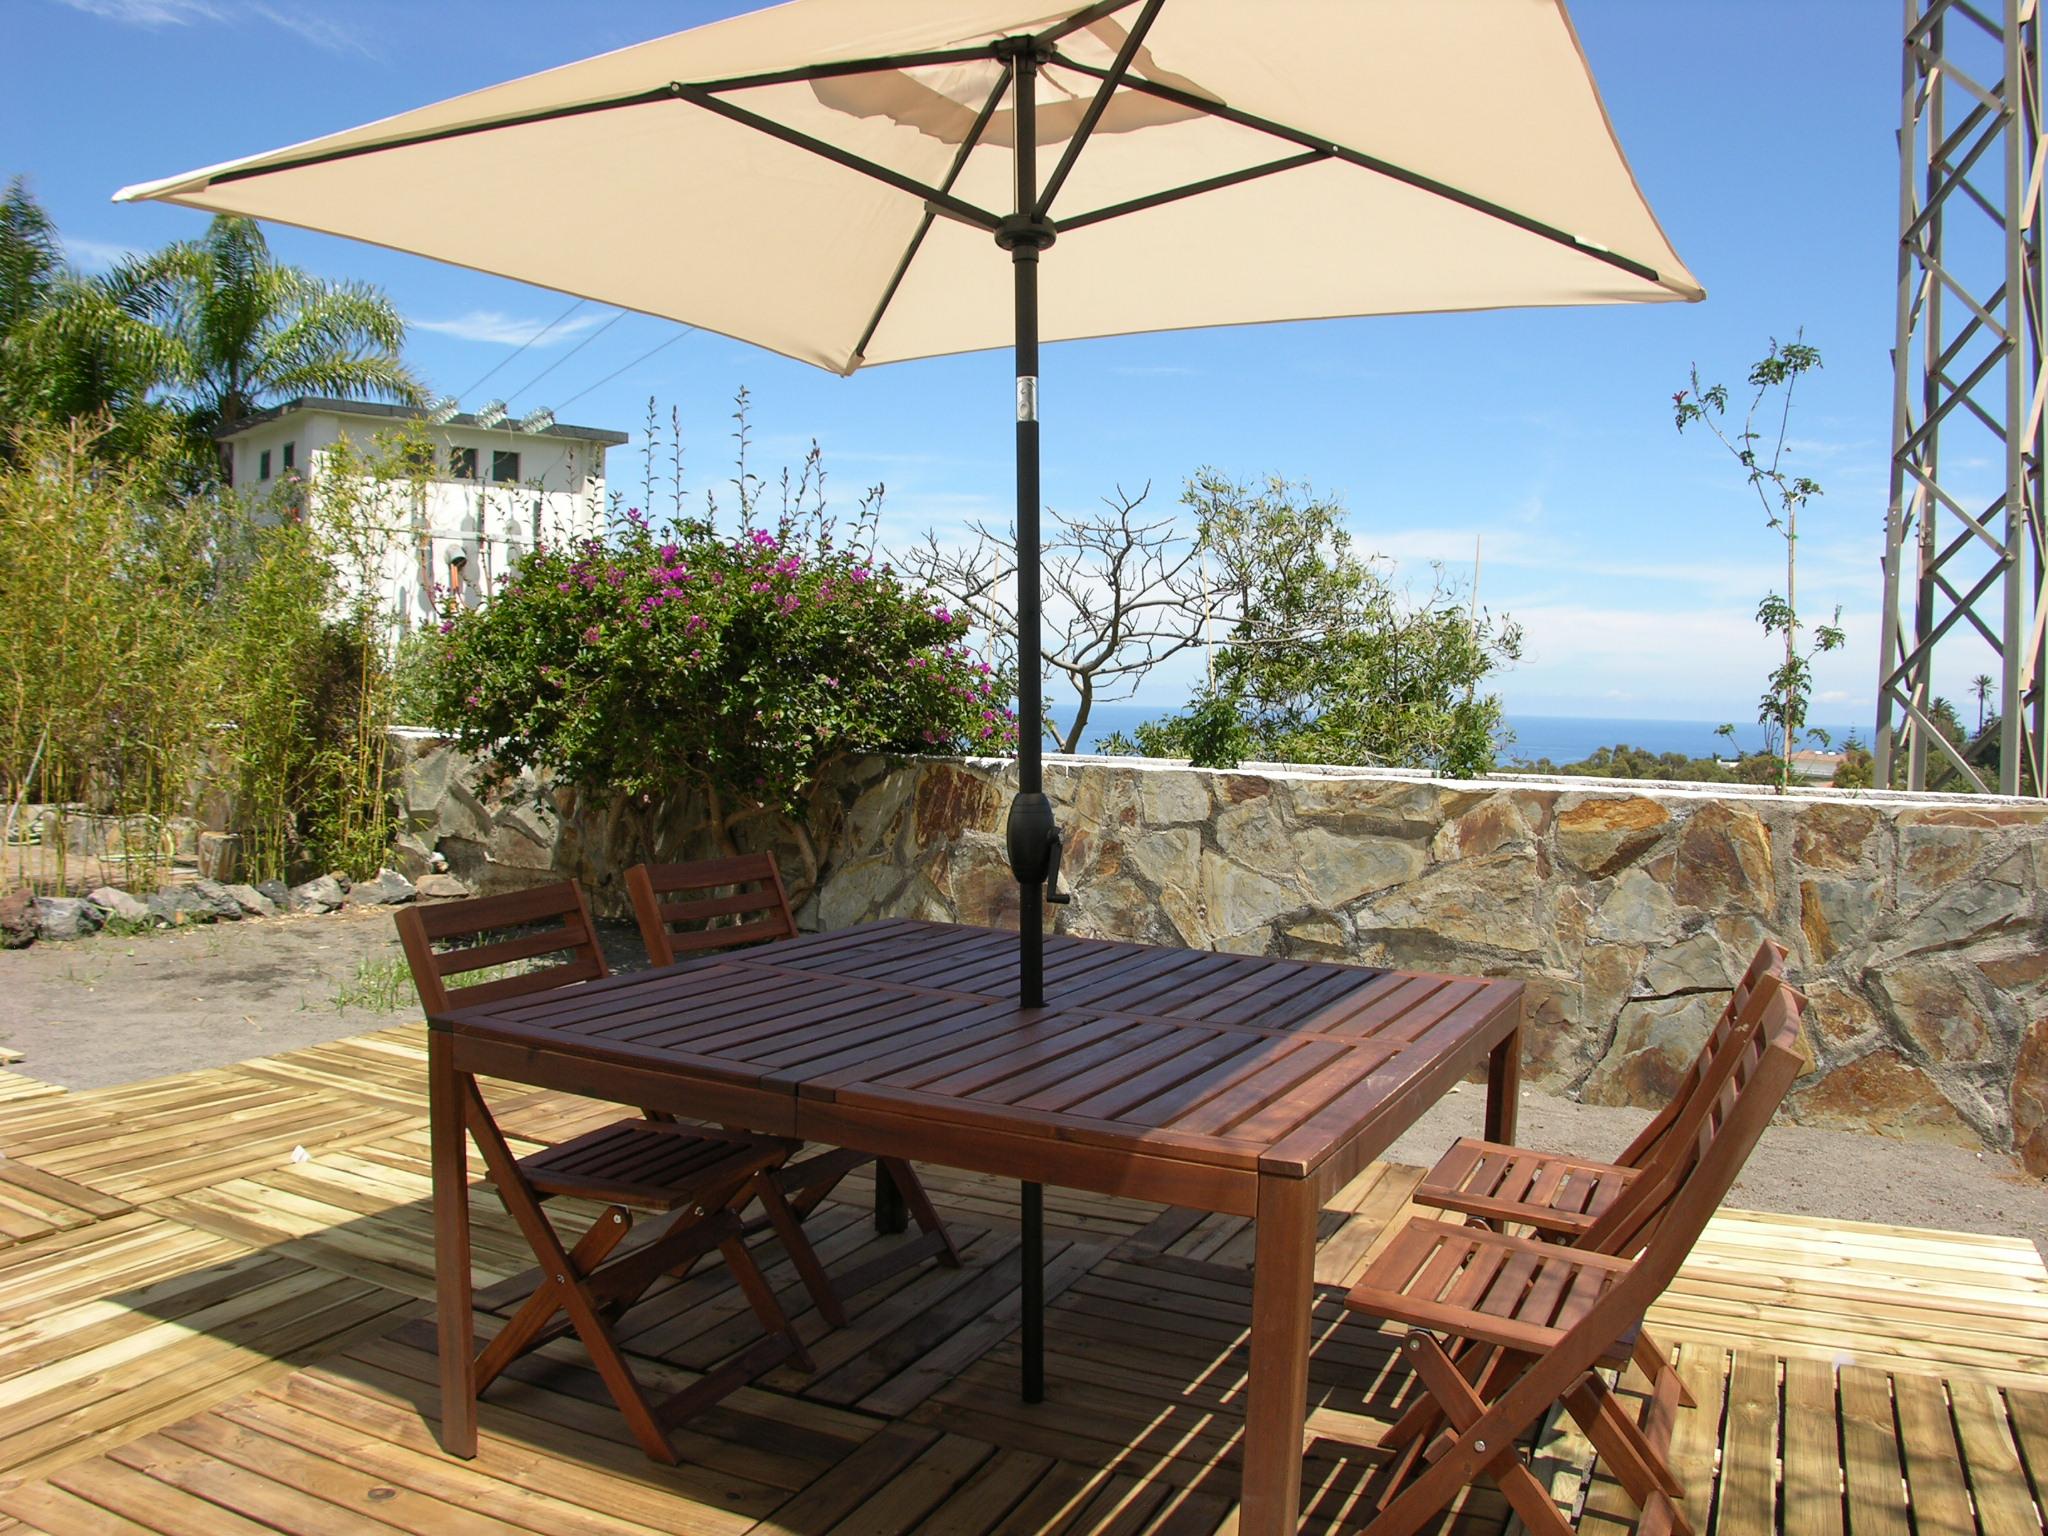 Maison de vacances Villa Vista La Quinta beheizbarer Pool kostenloses WLAN Grill (2124407), Santa Ursula, Ténérife, Iles Canaries, Espagne, image 8